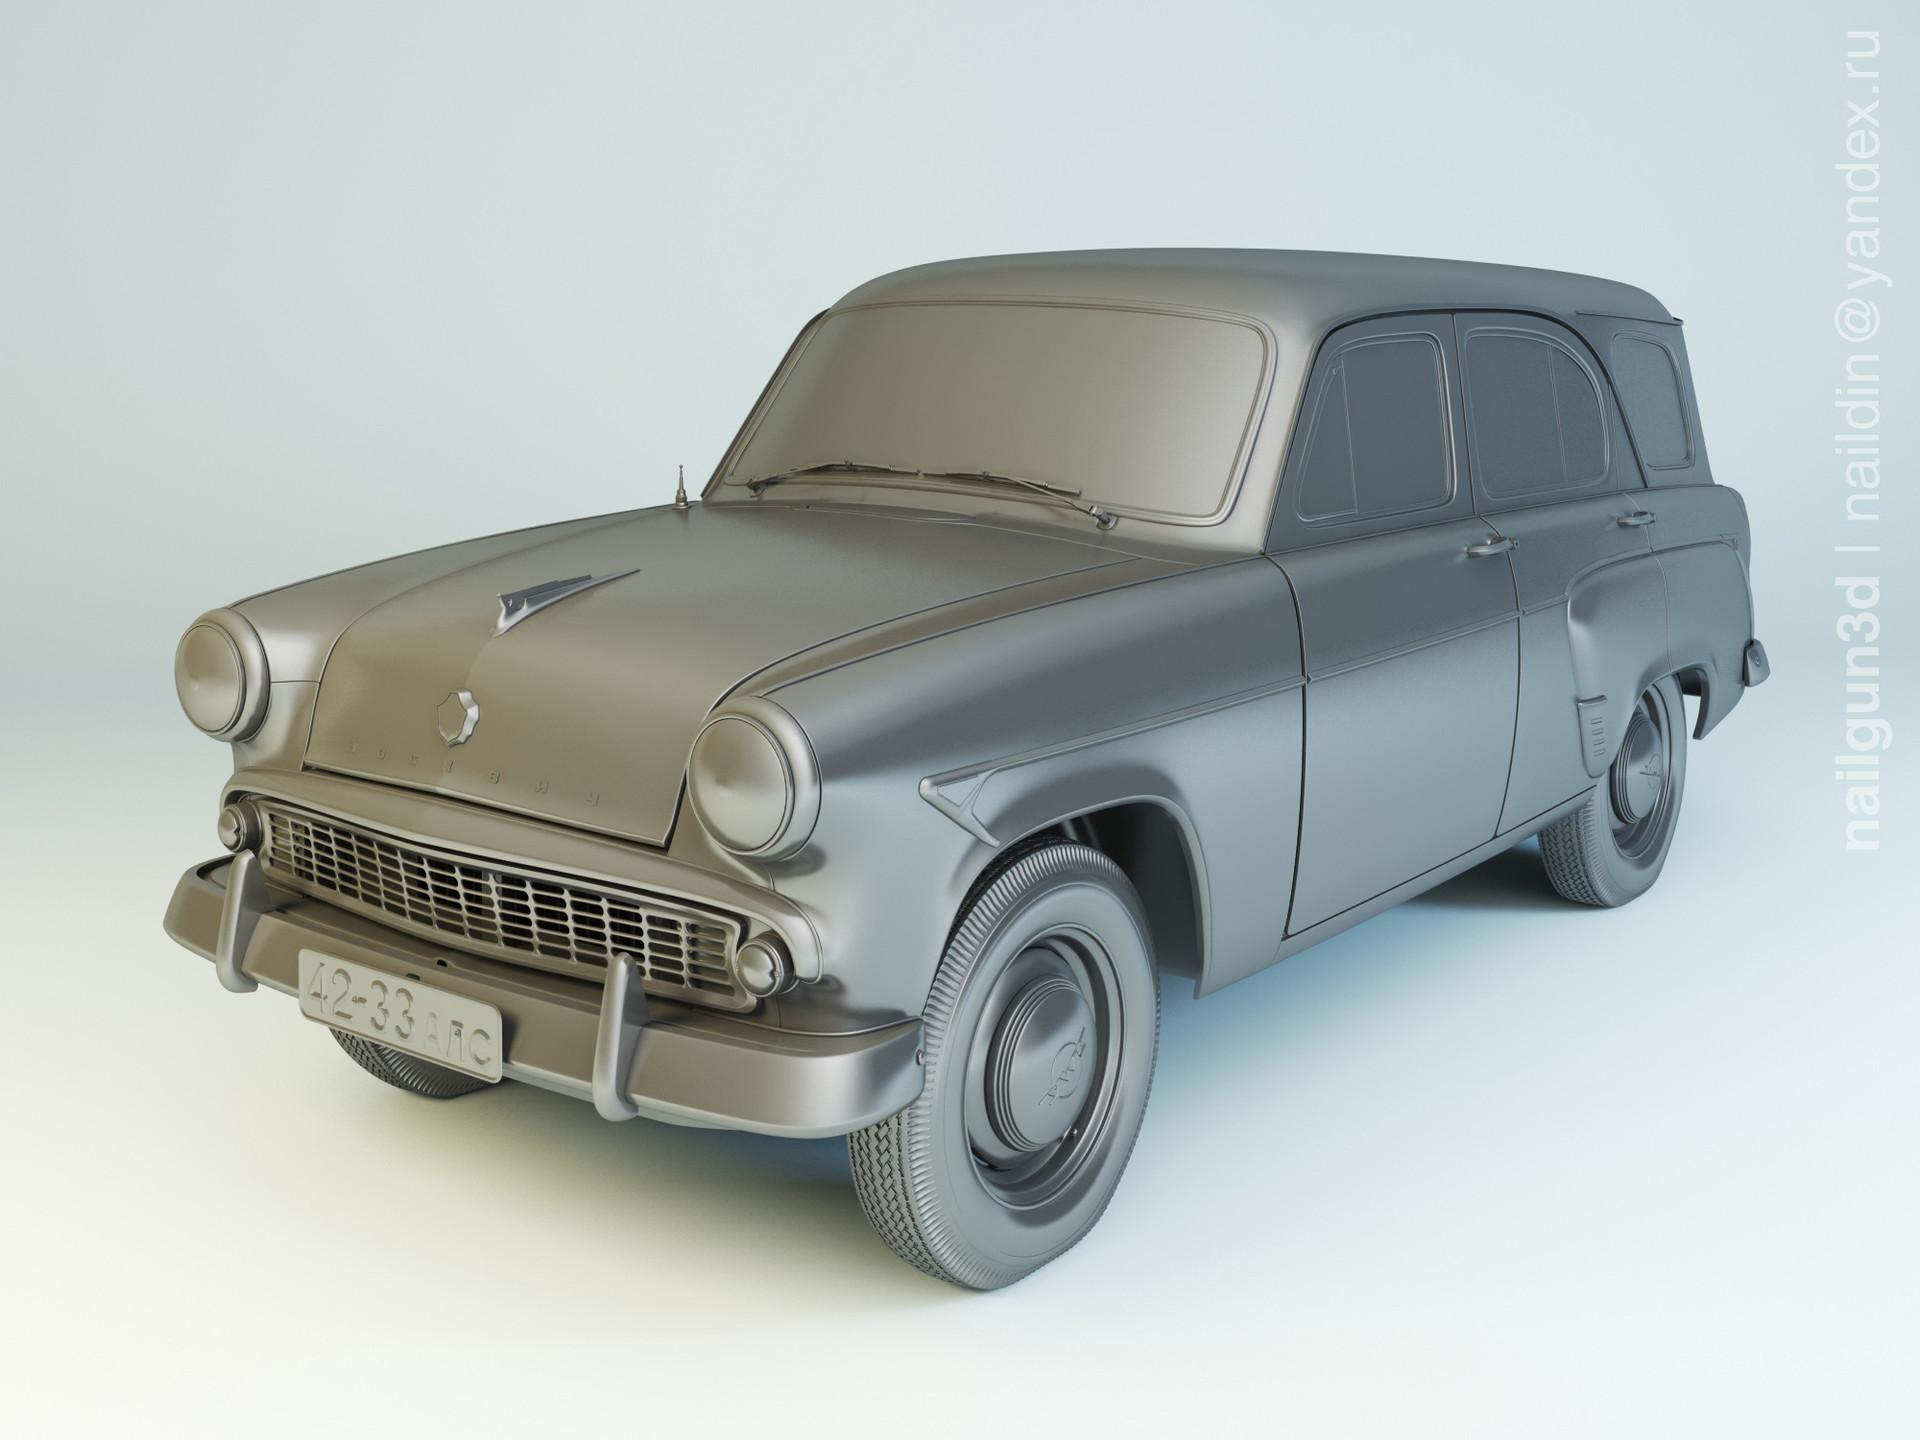 Nail khusnutdinov als 204 000 moskvich 423 1960 modelling 0